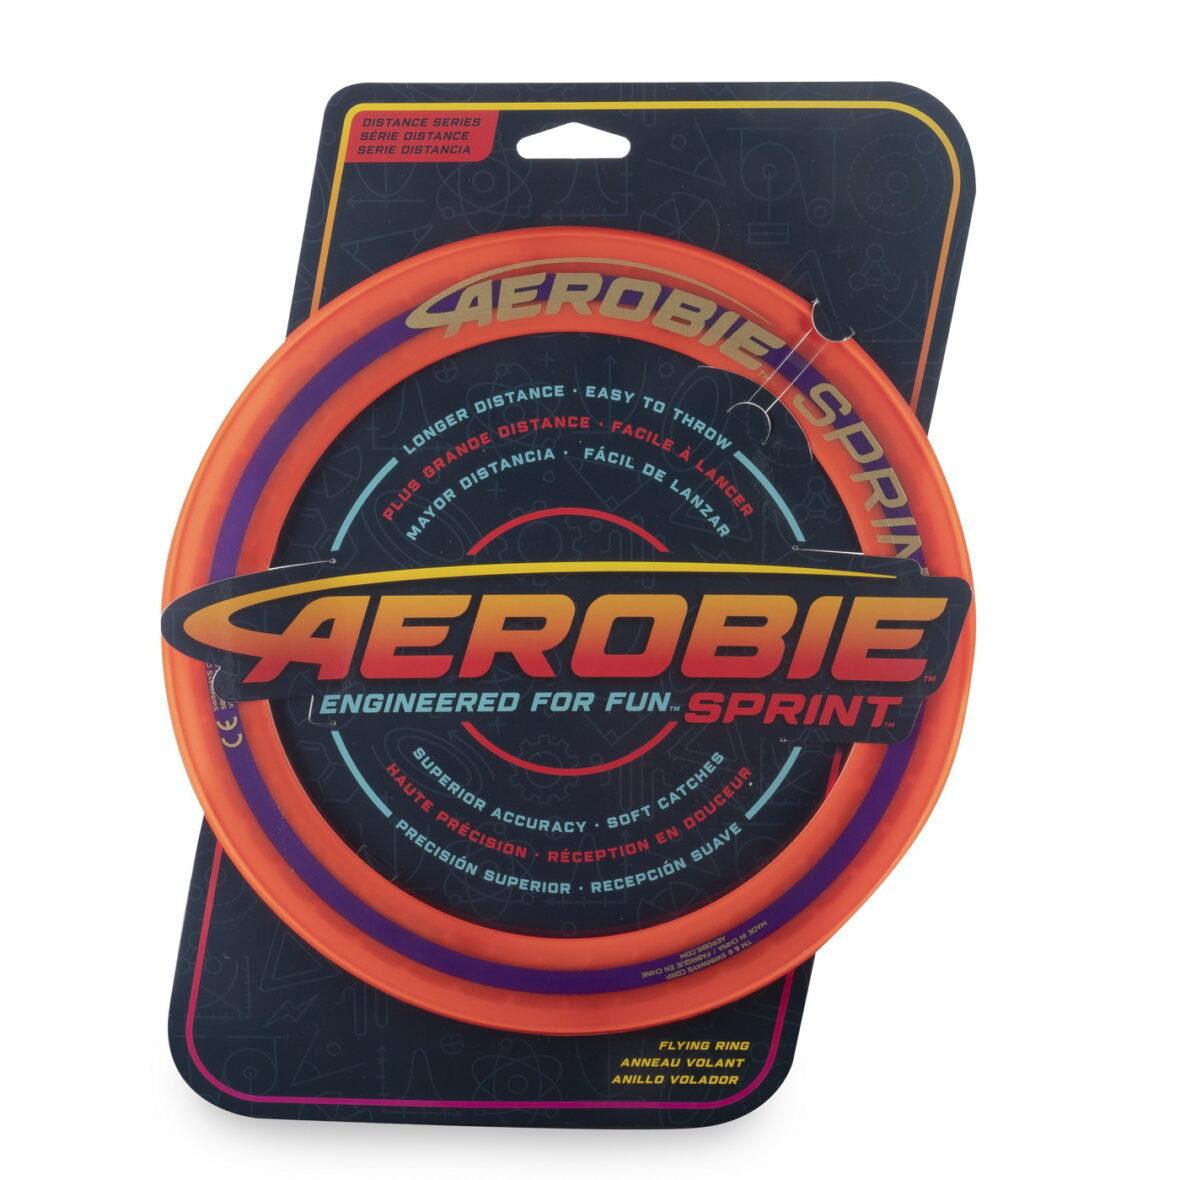 Swimways  Aerobie Disc Zburator Portocaliu Construit Pentru Viteza